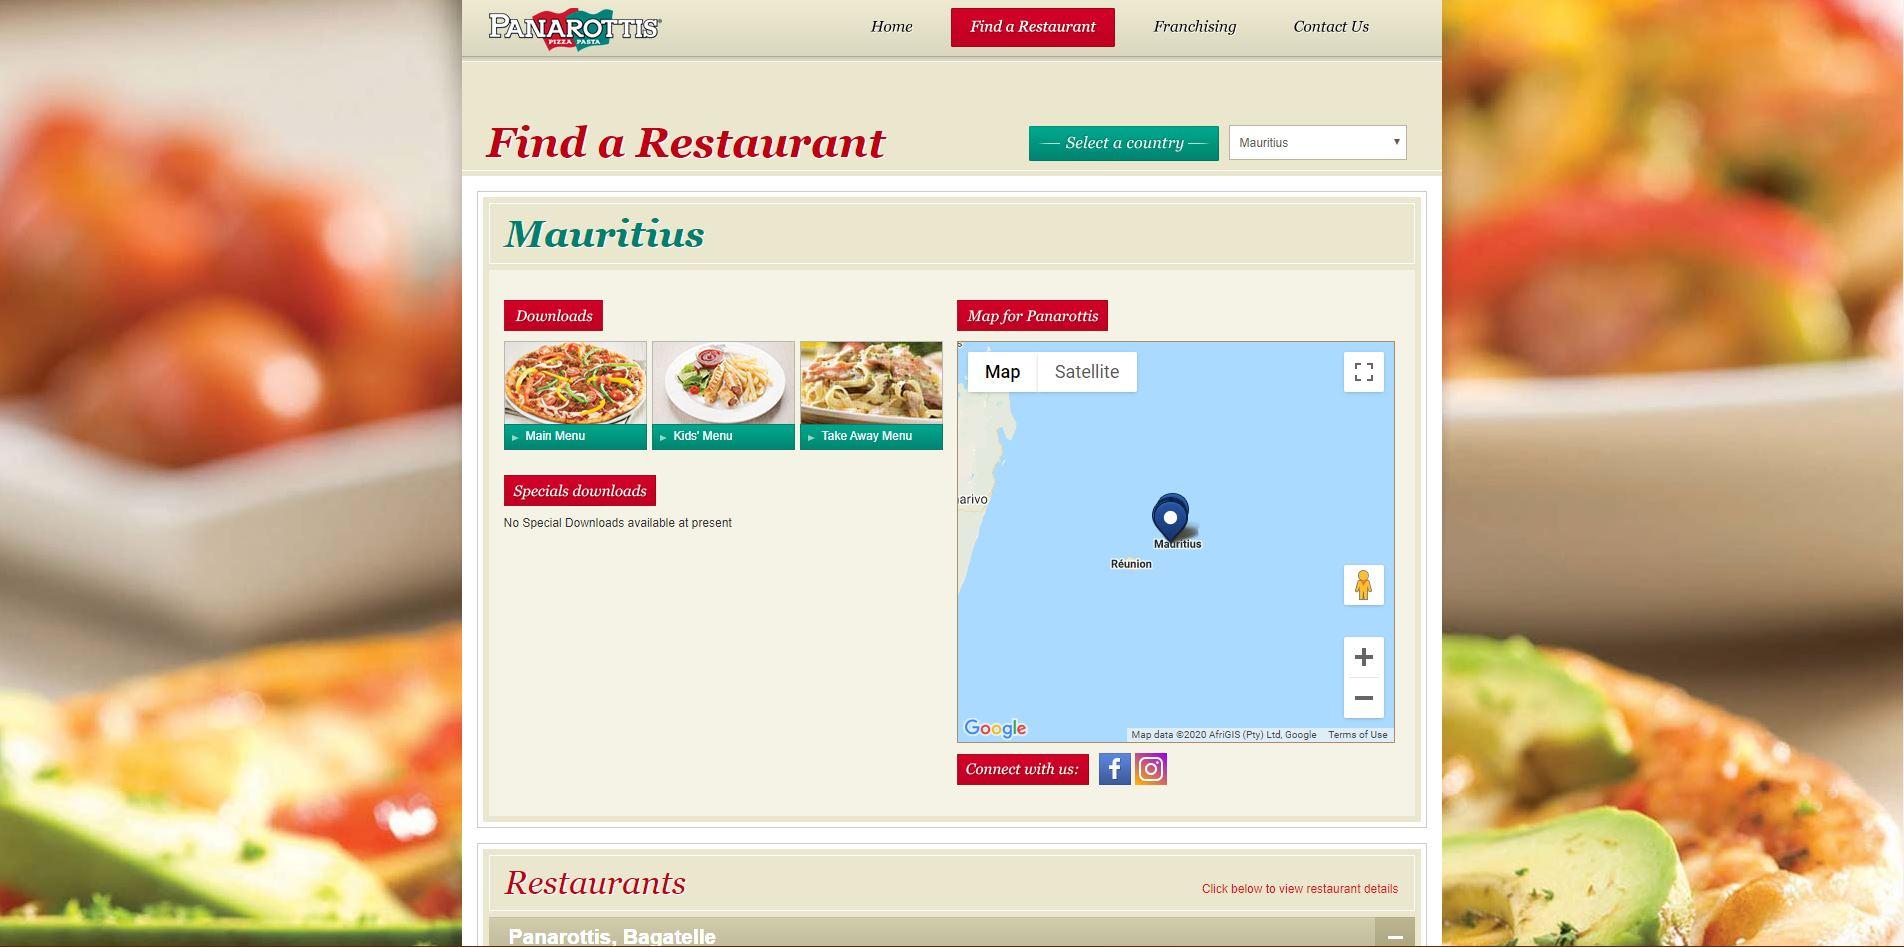 Panarottis-digital-marketing-mauritius-ecommerce